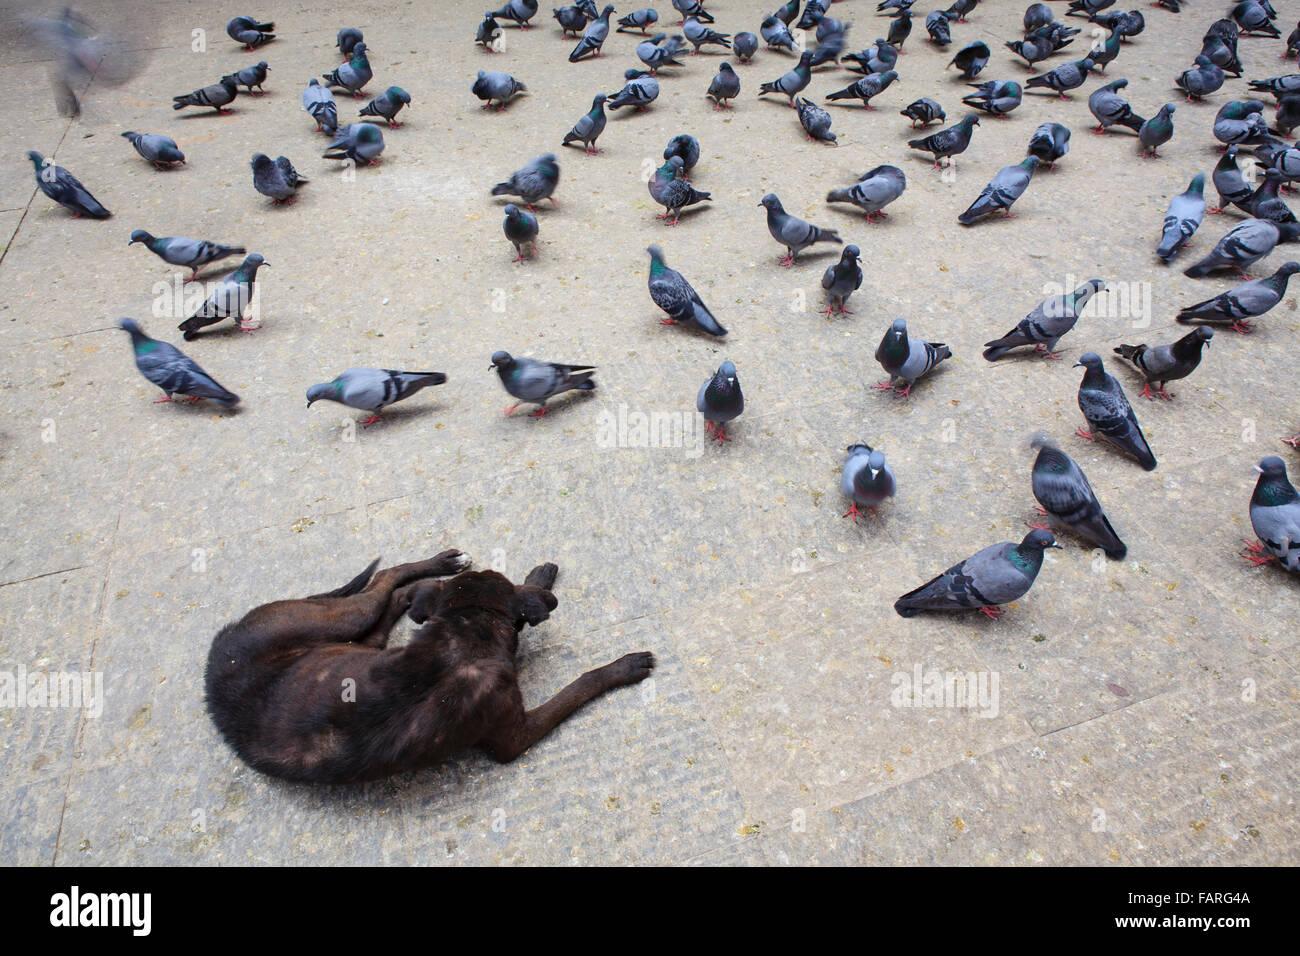 Black dog and pigeons in the street. Kathmandu. Nepal. - Stock Image